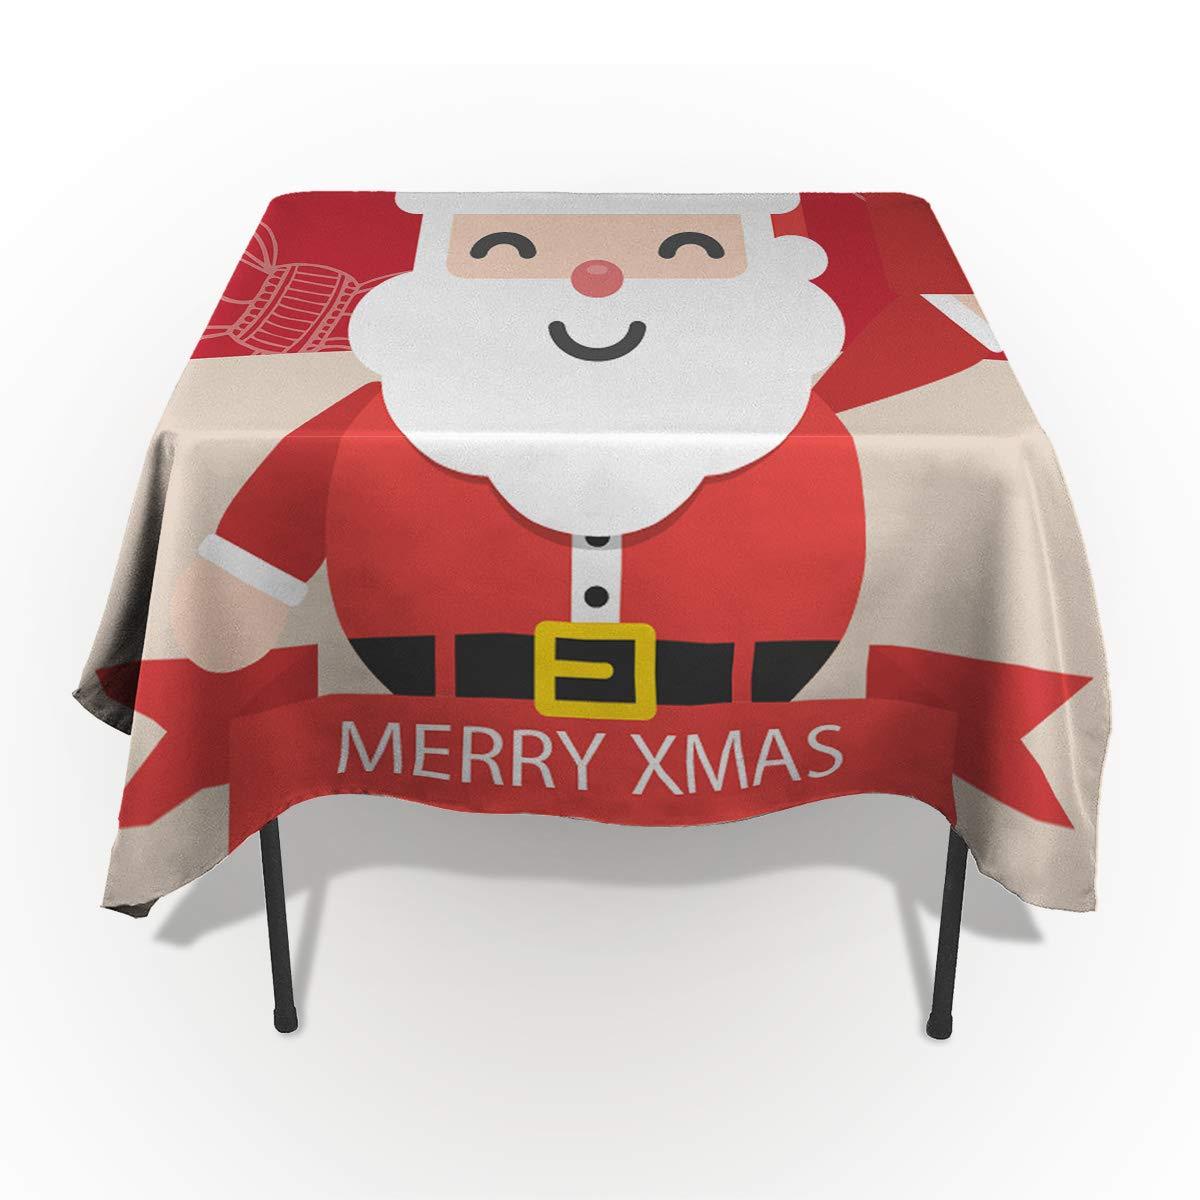 Edwiinsa 水滴がこぼれない洗濯可能な布製テーブルクロス クリスマス エルク Xms ツリー ホリー植物 ブラックとホワイト テーブルカバー ダイニングビュッフェ テーブルパーティー ピクニックテーブル 長方形/長方形 54 x 54 In WSJ-181113-zbuXmas-SWTQ00918ZBACEDA 54 x 54 In Santaclaus86eda9275 B07KGRRN2B